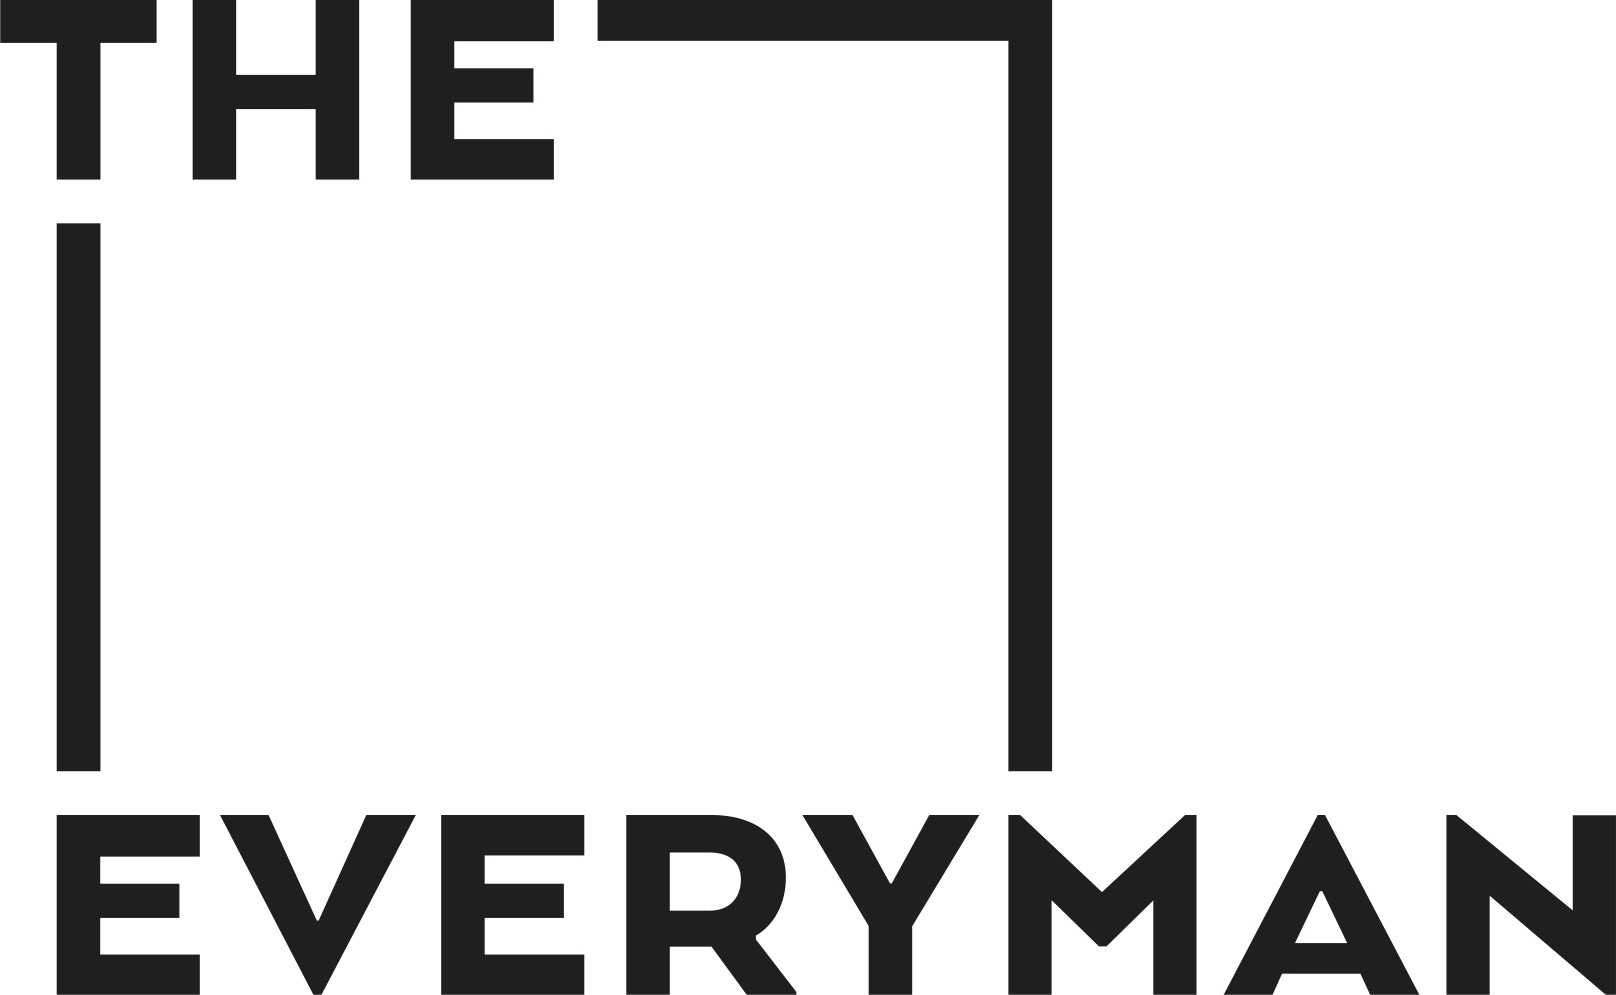 The Everyman logo